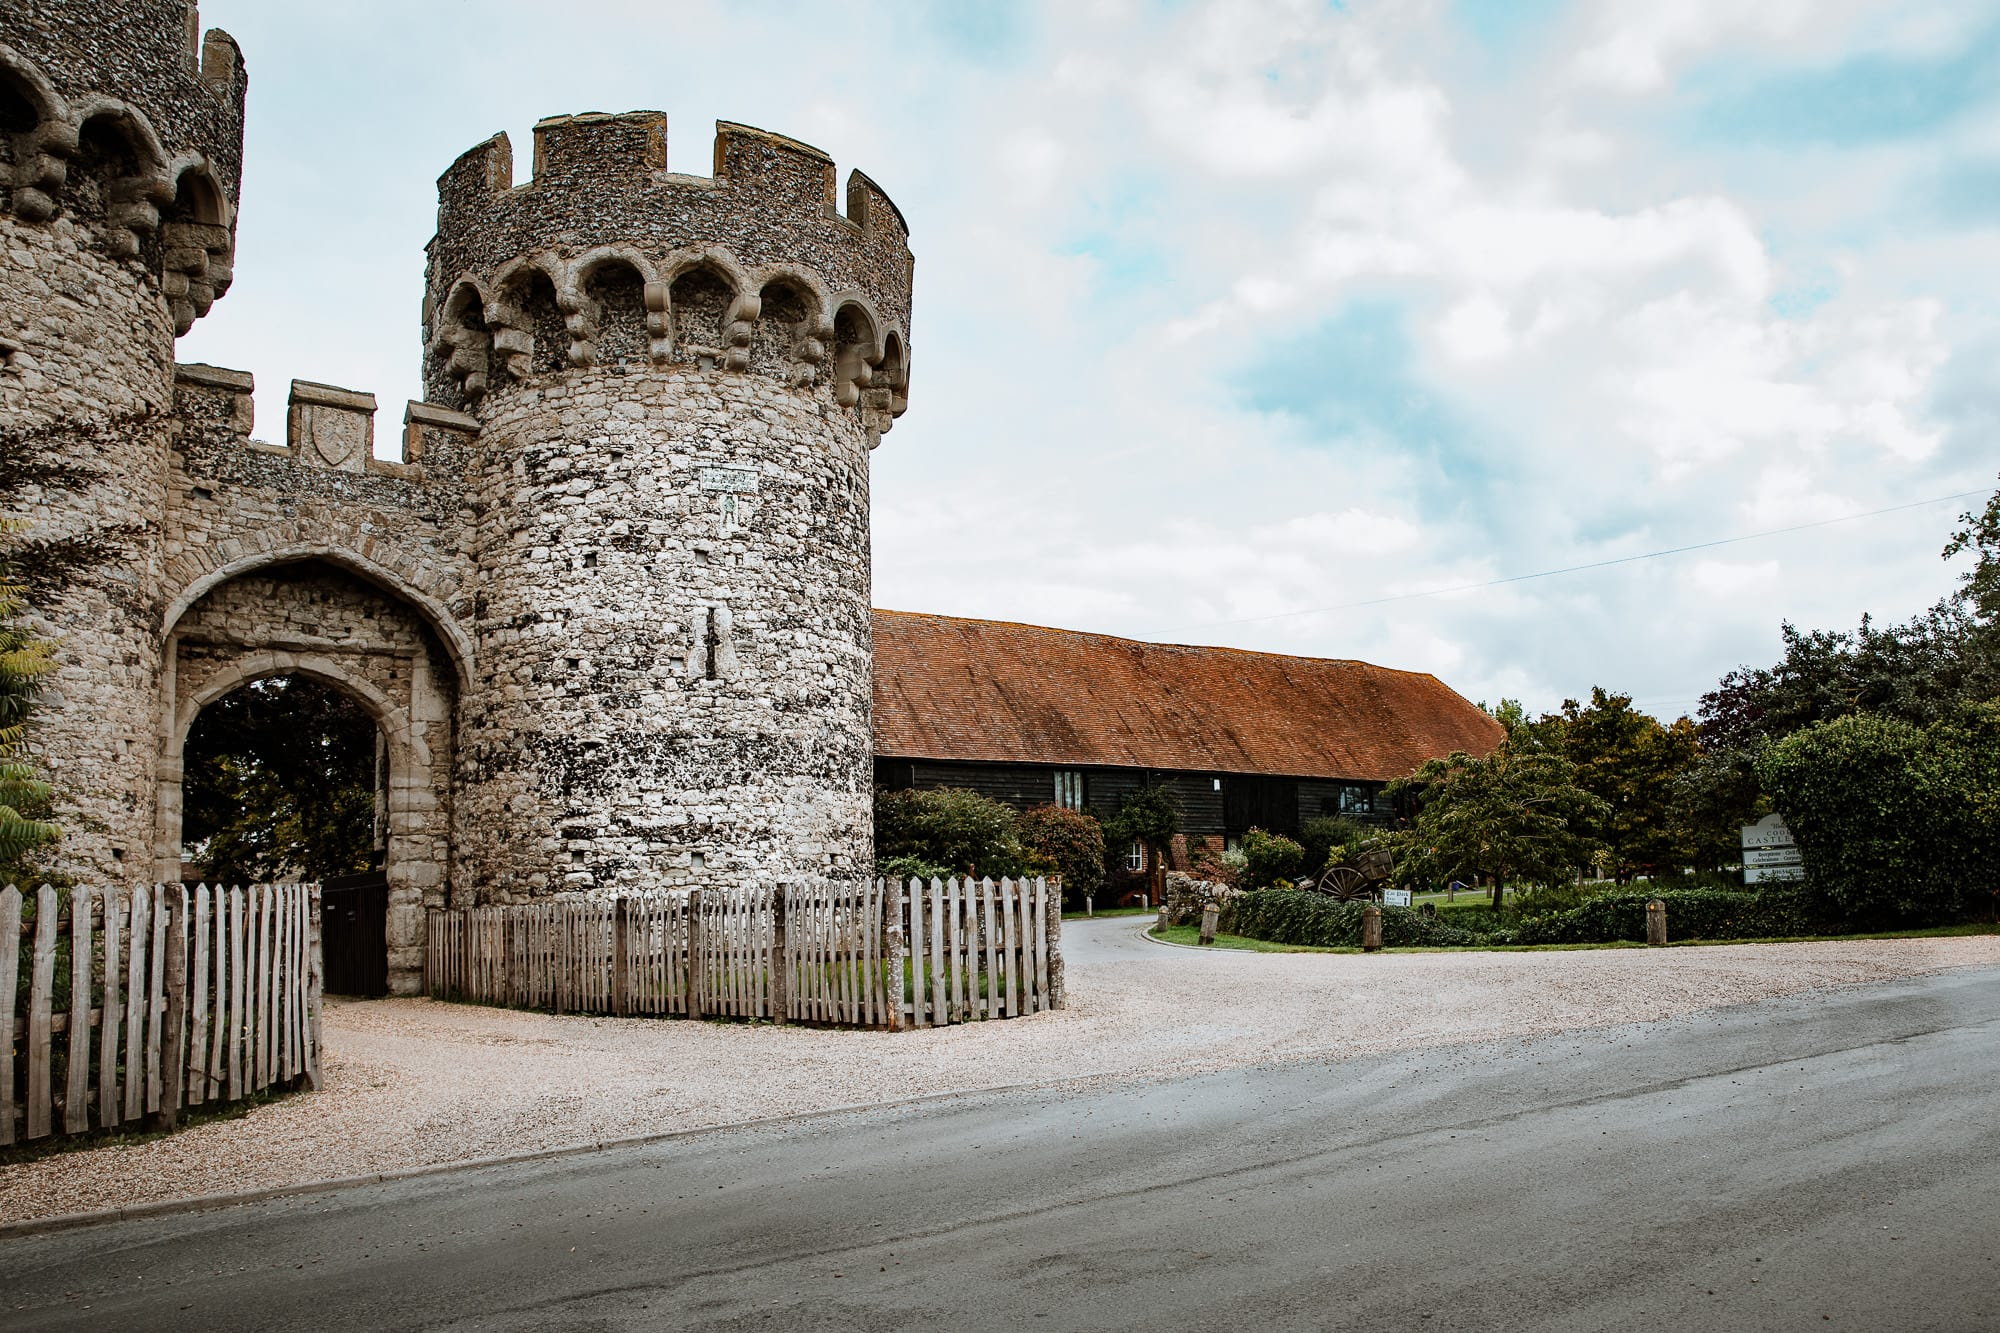 Gate house of Cooling Castle, Kent Wedding venue